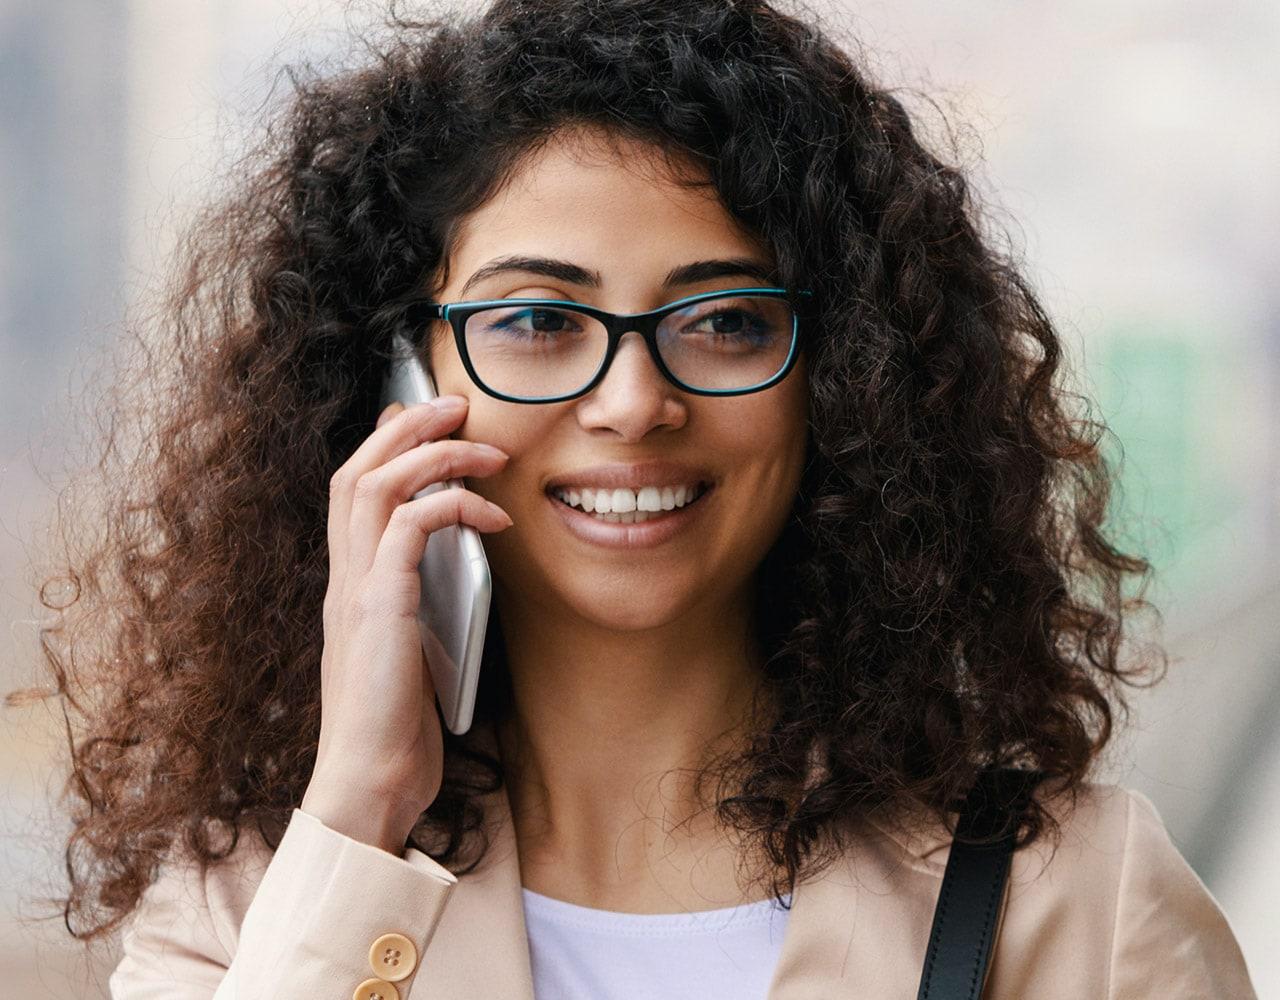 Contact Us - Qatar Customer Service | Western Union